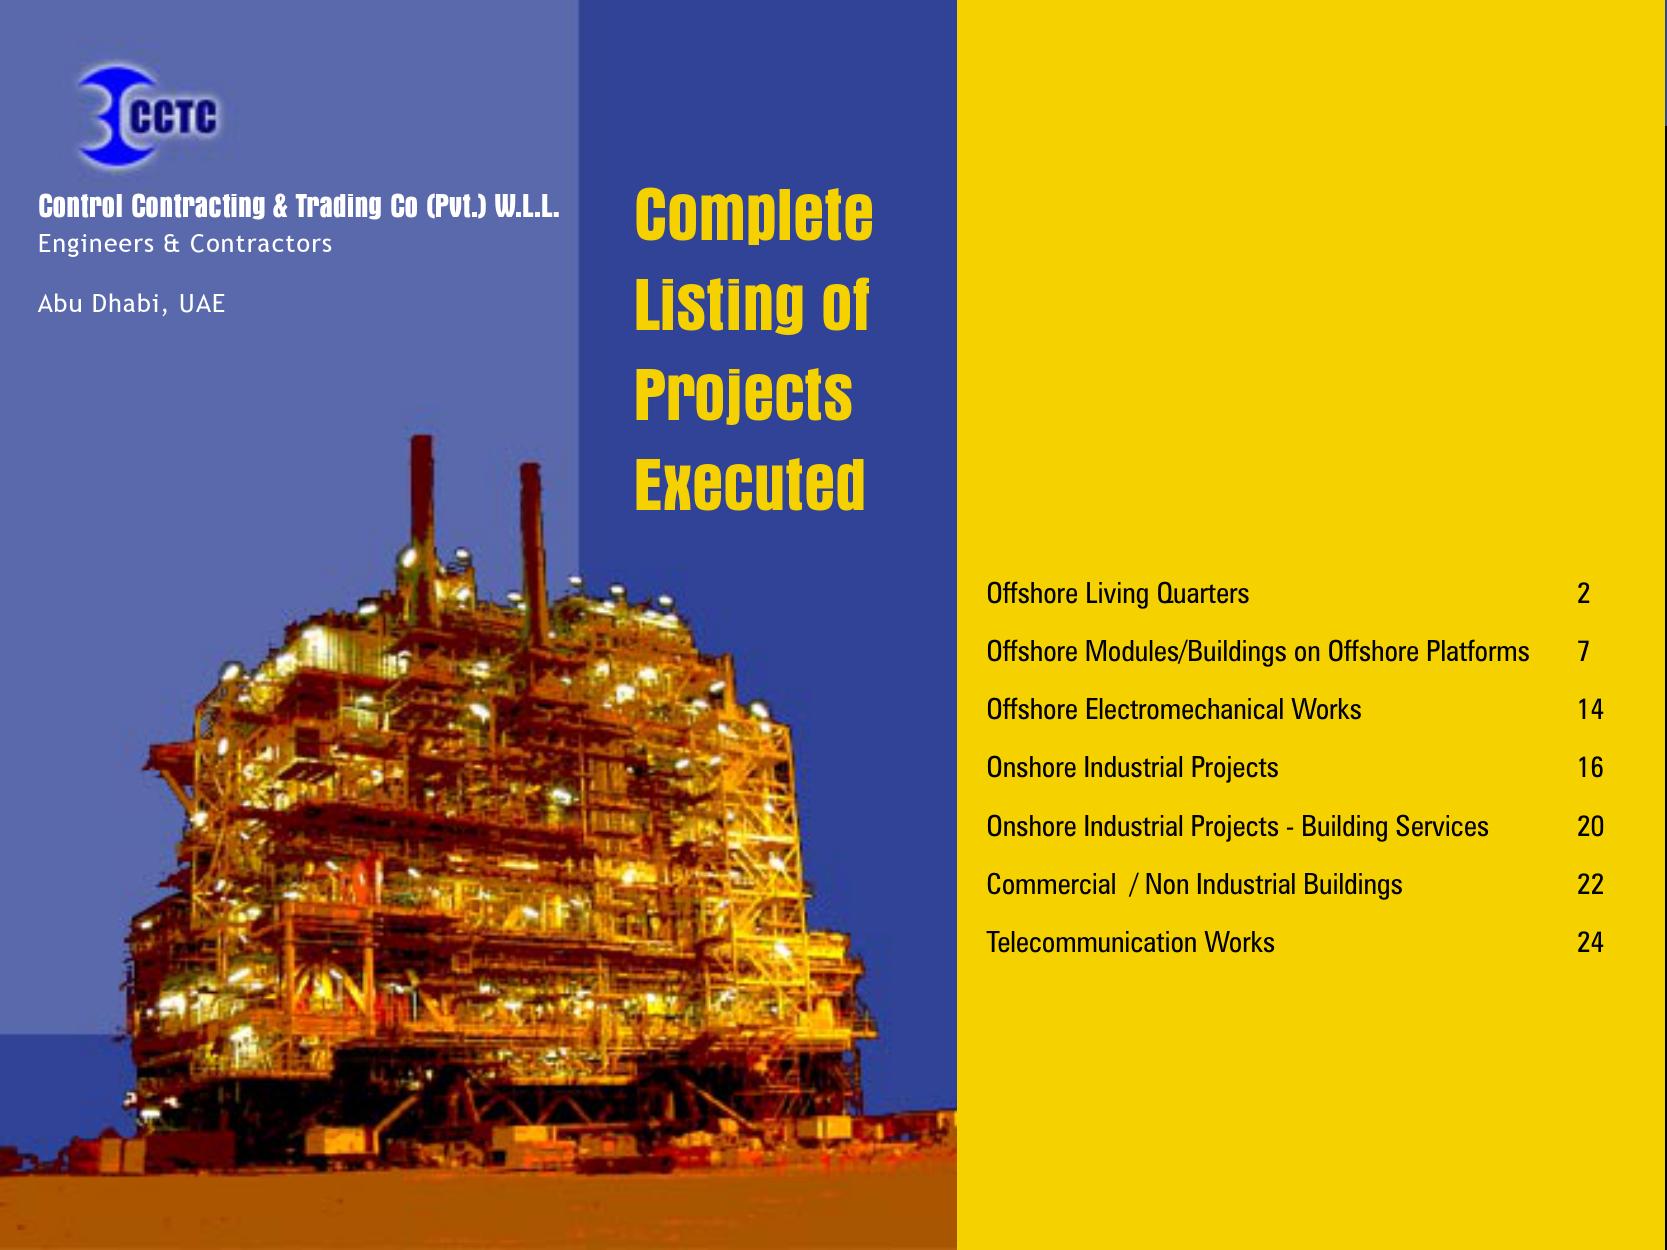 Project elaborations - CCTC Engineering Contracting Abu Dhabi UAE